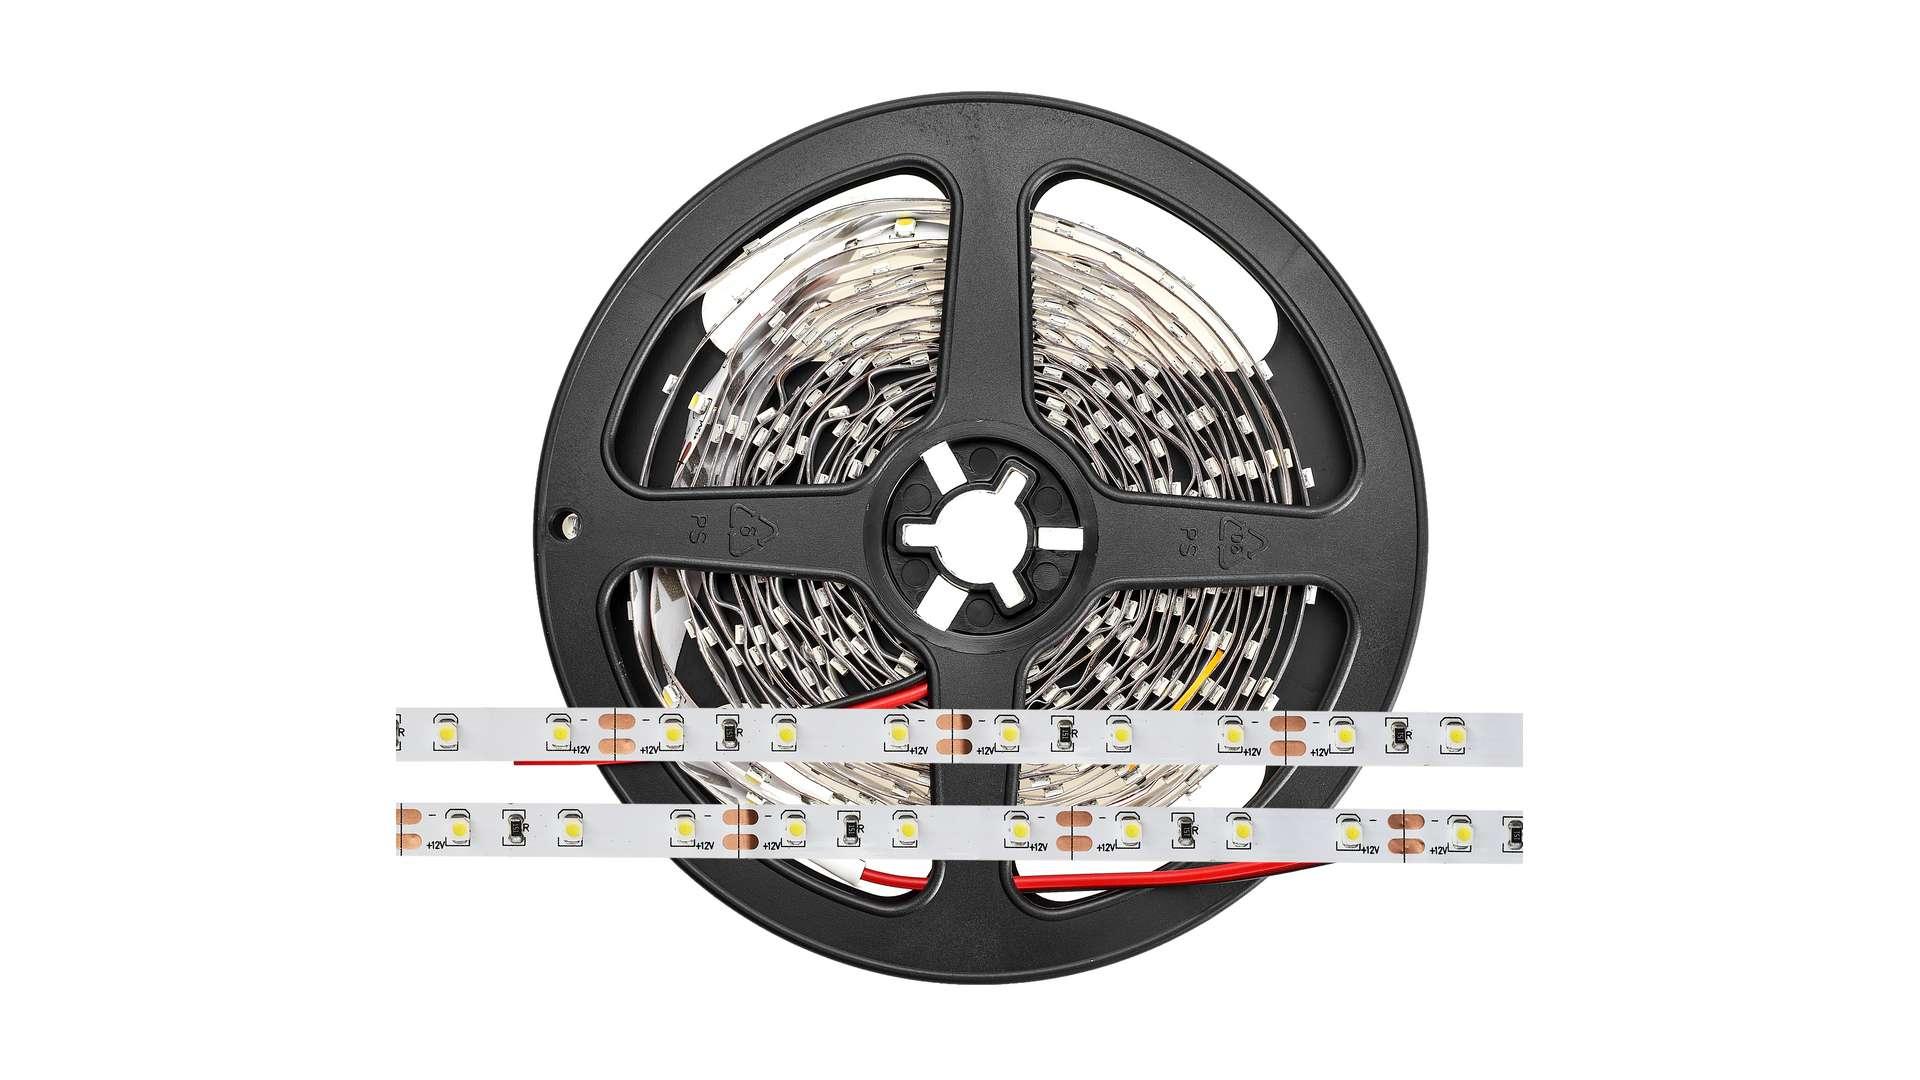 Taśma 300 LED 60 LED/m 2835 SMD, Neutralna